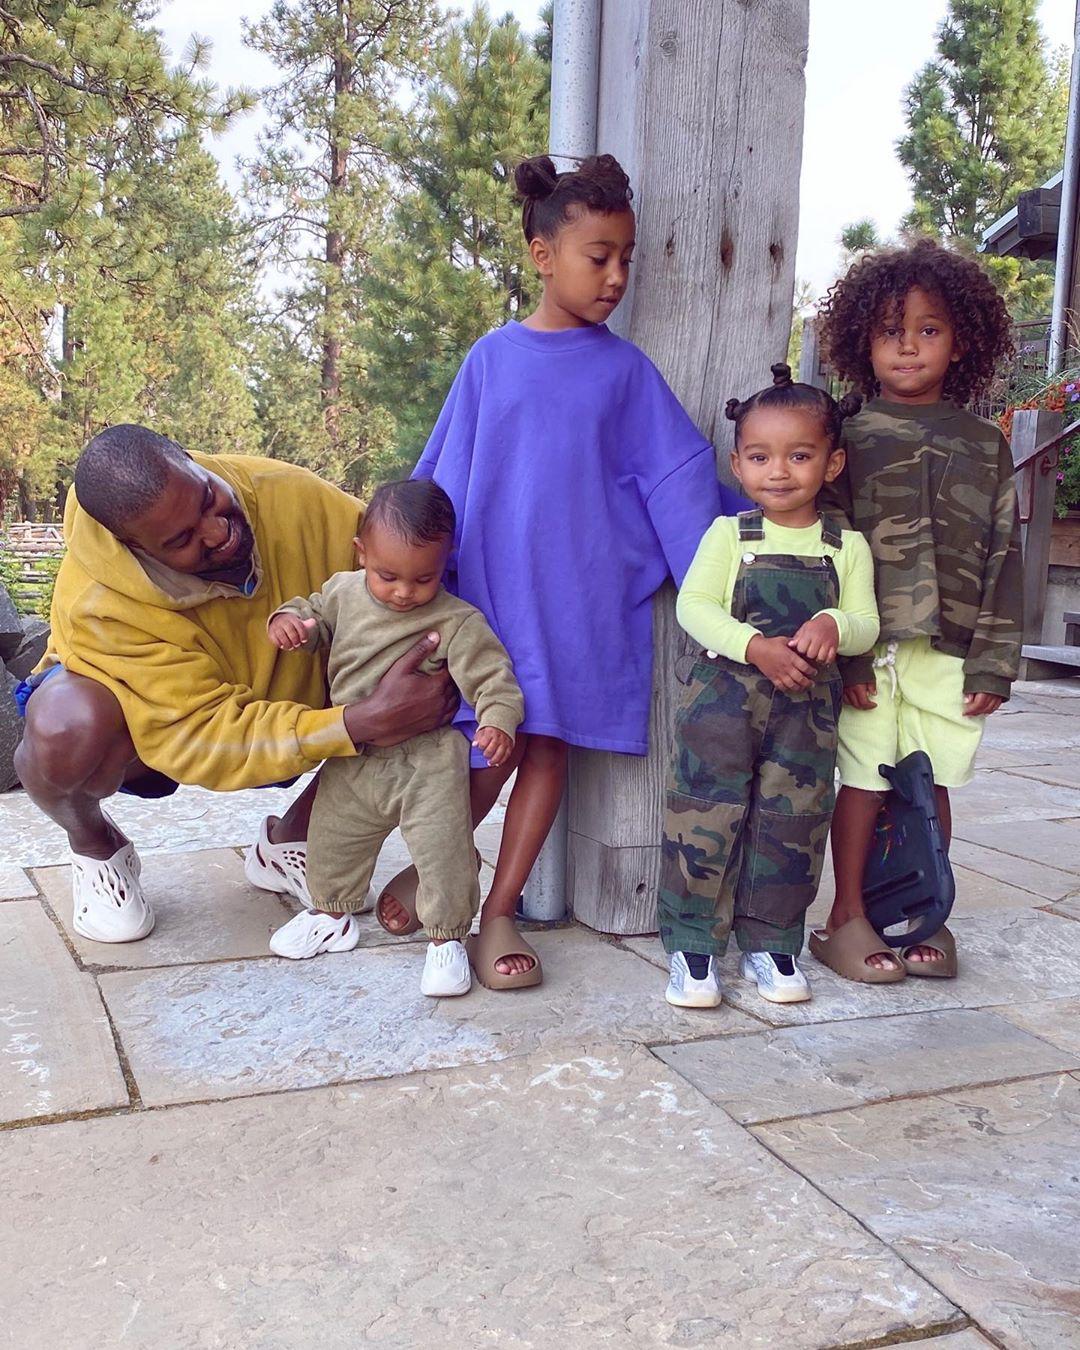 Kim Kardashian Shares Cute Photos of Kids and Kanye West